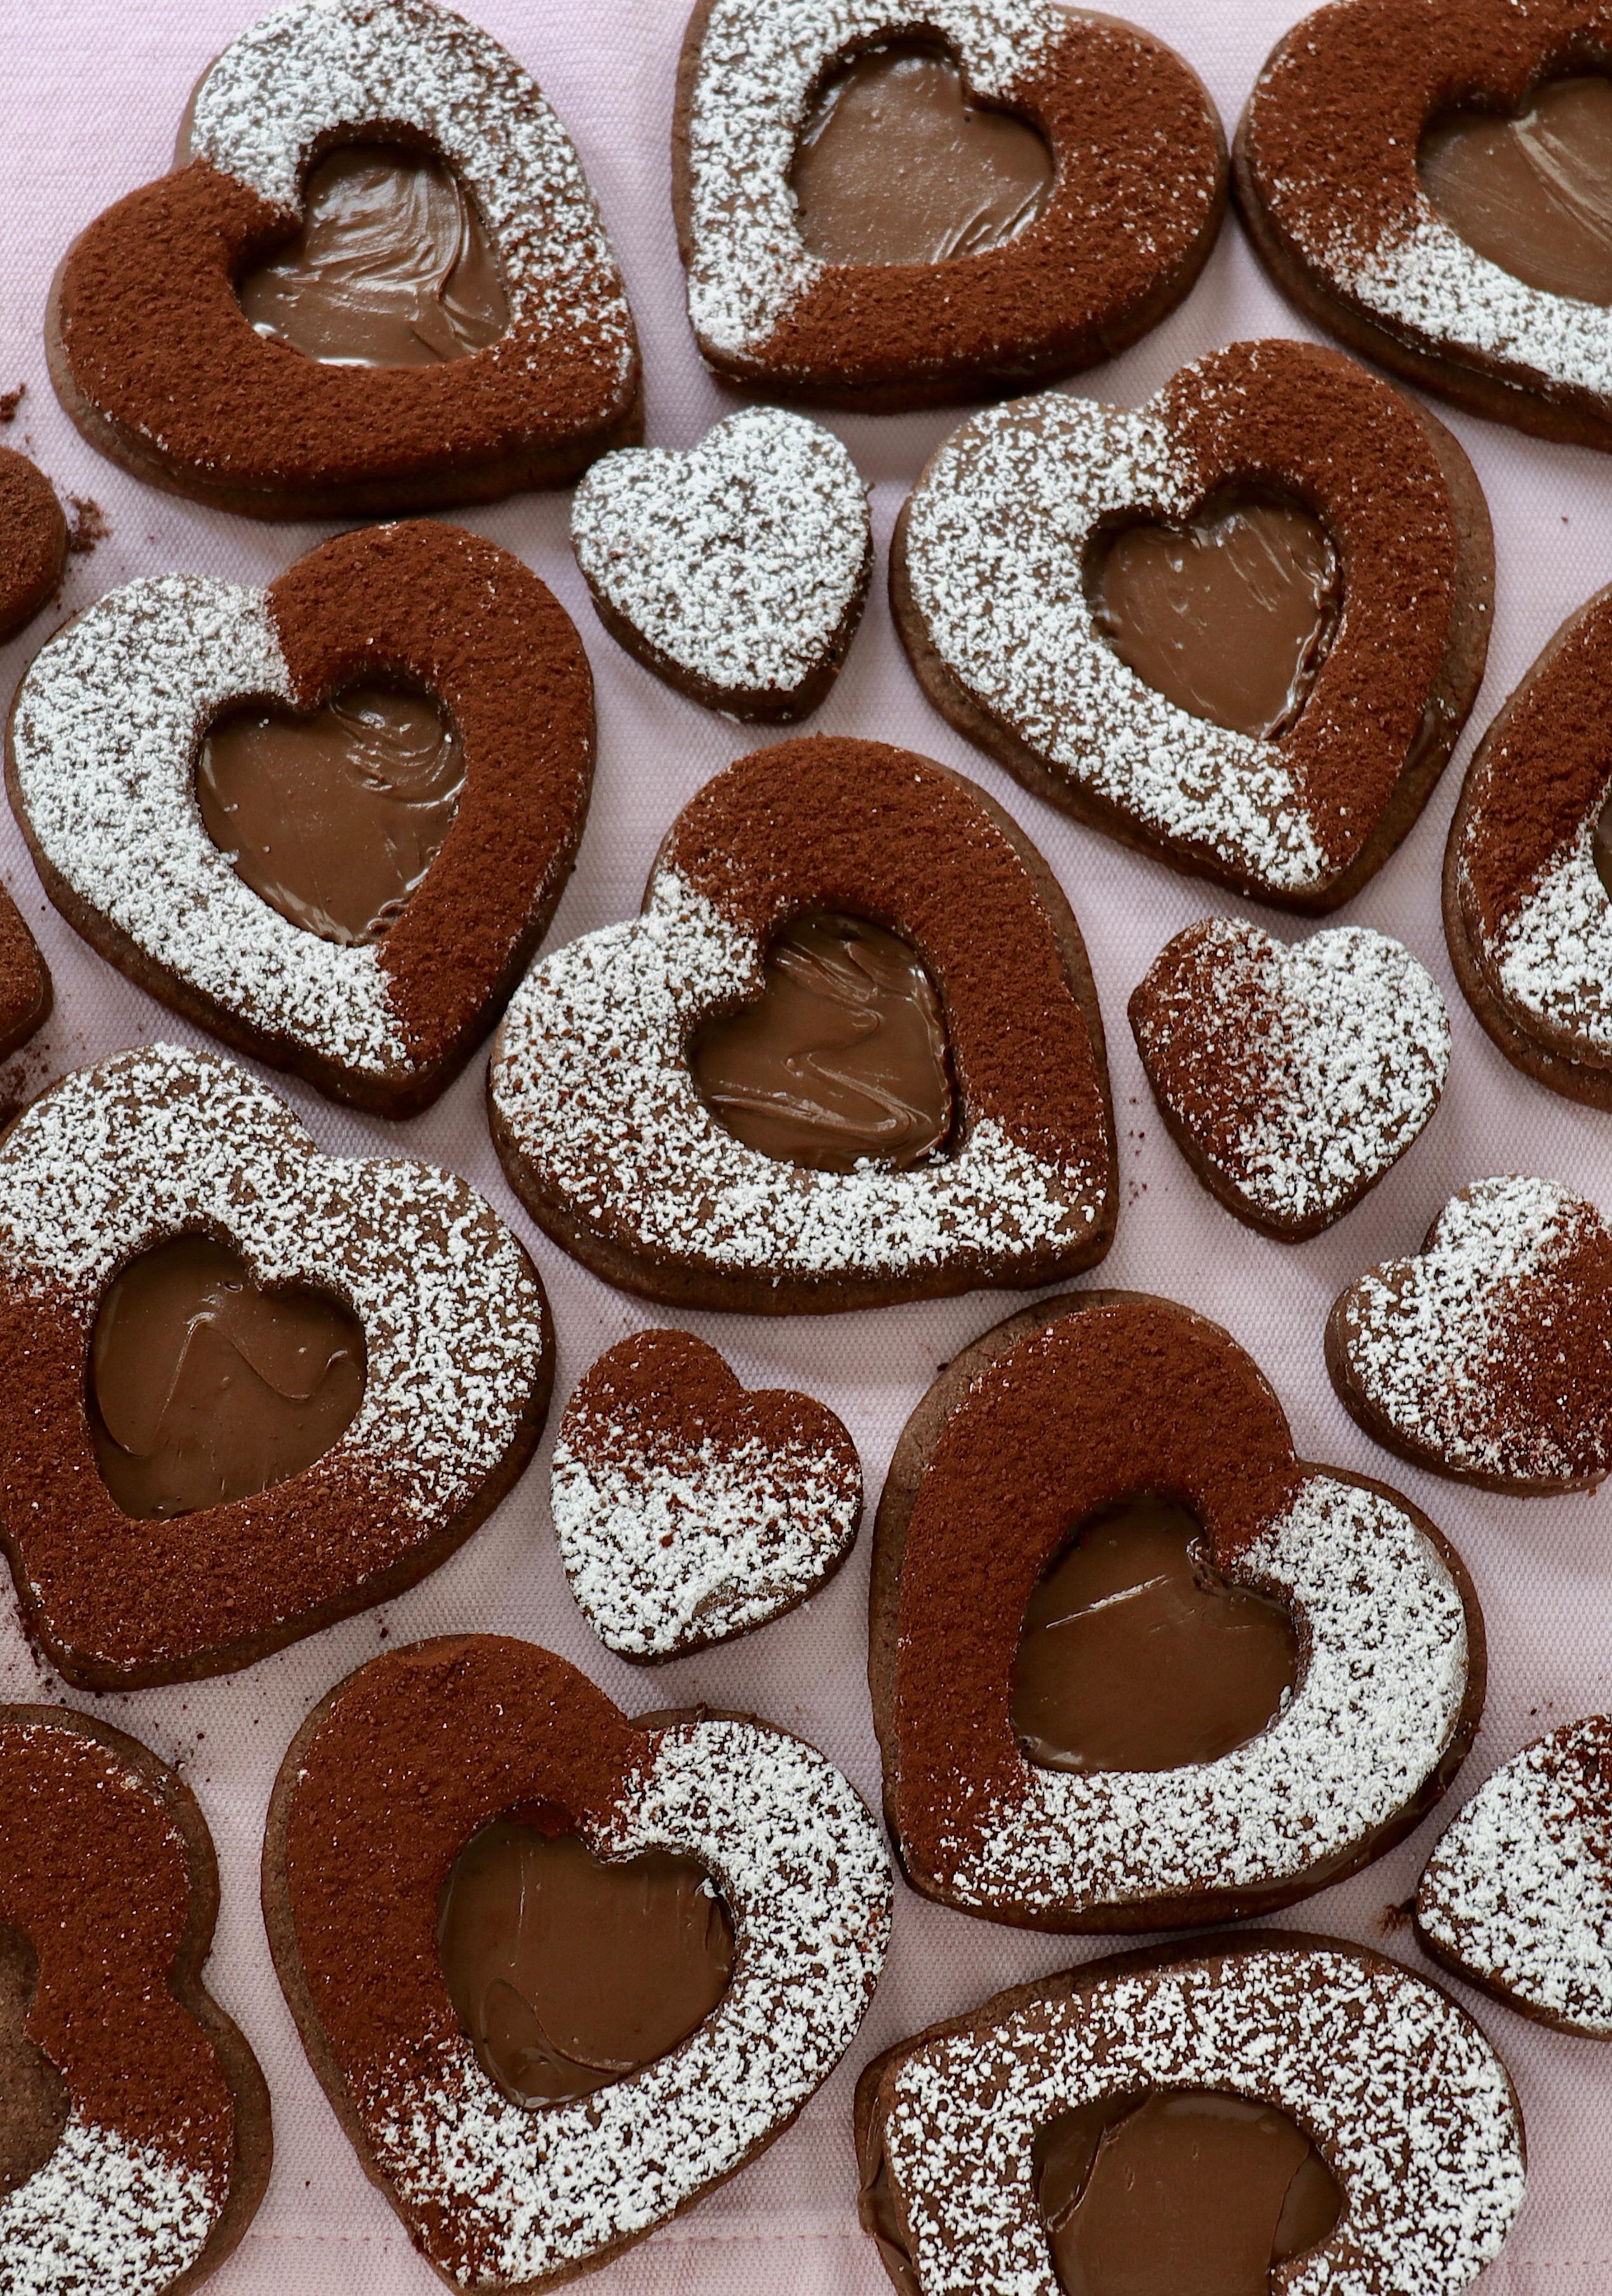 Leckere Schokokekse mit Nutella Haselnusscreme